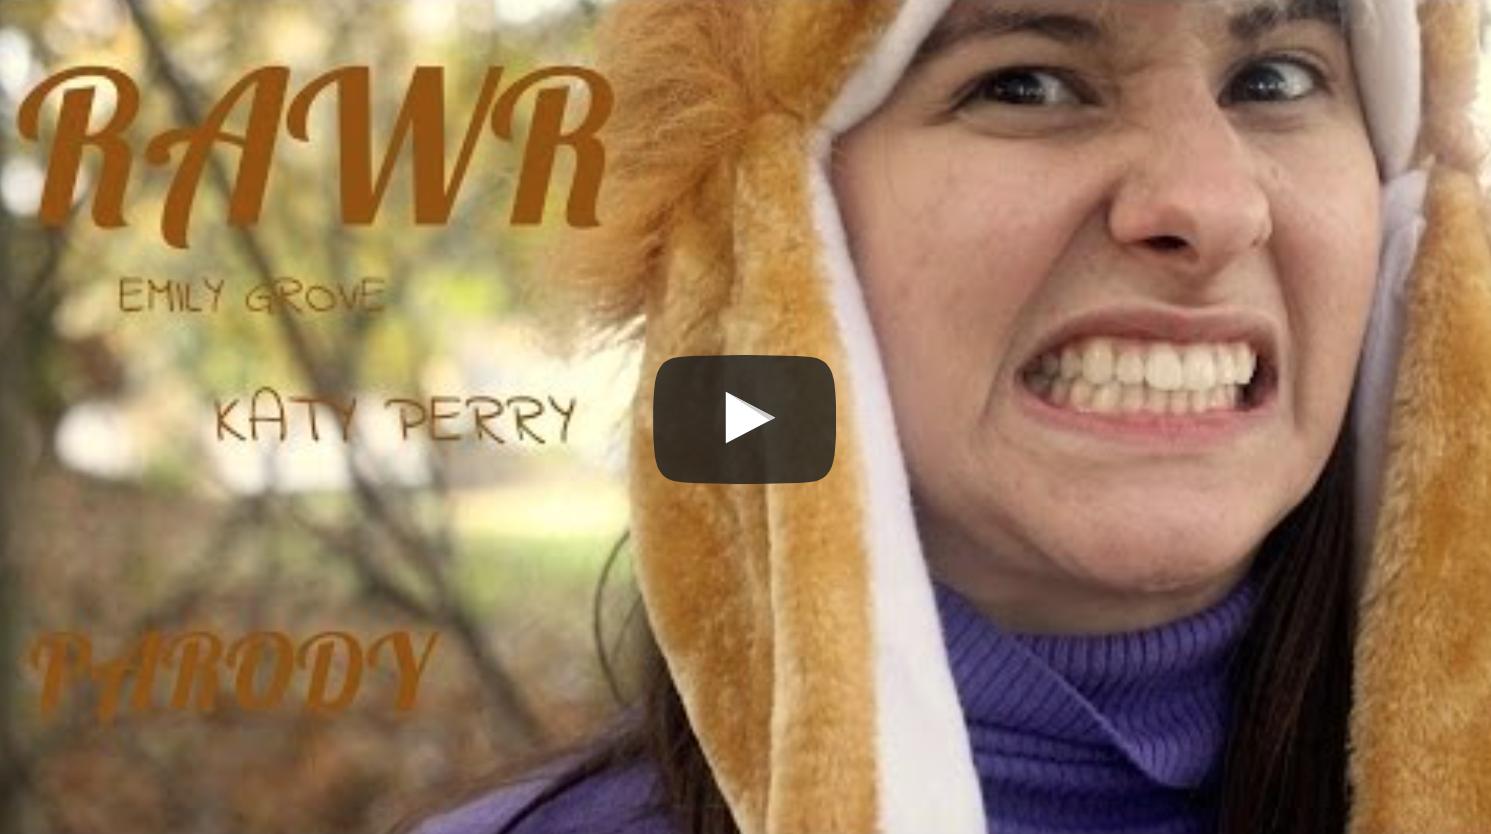 RAWR (ROAR Katy Perry Parody) VeganFlix